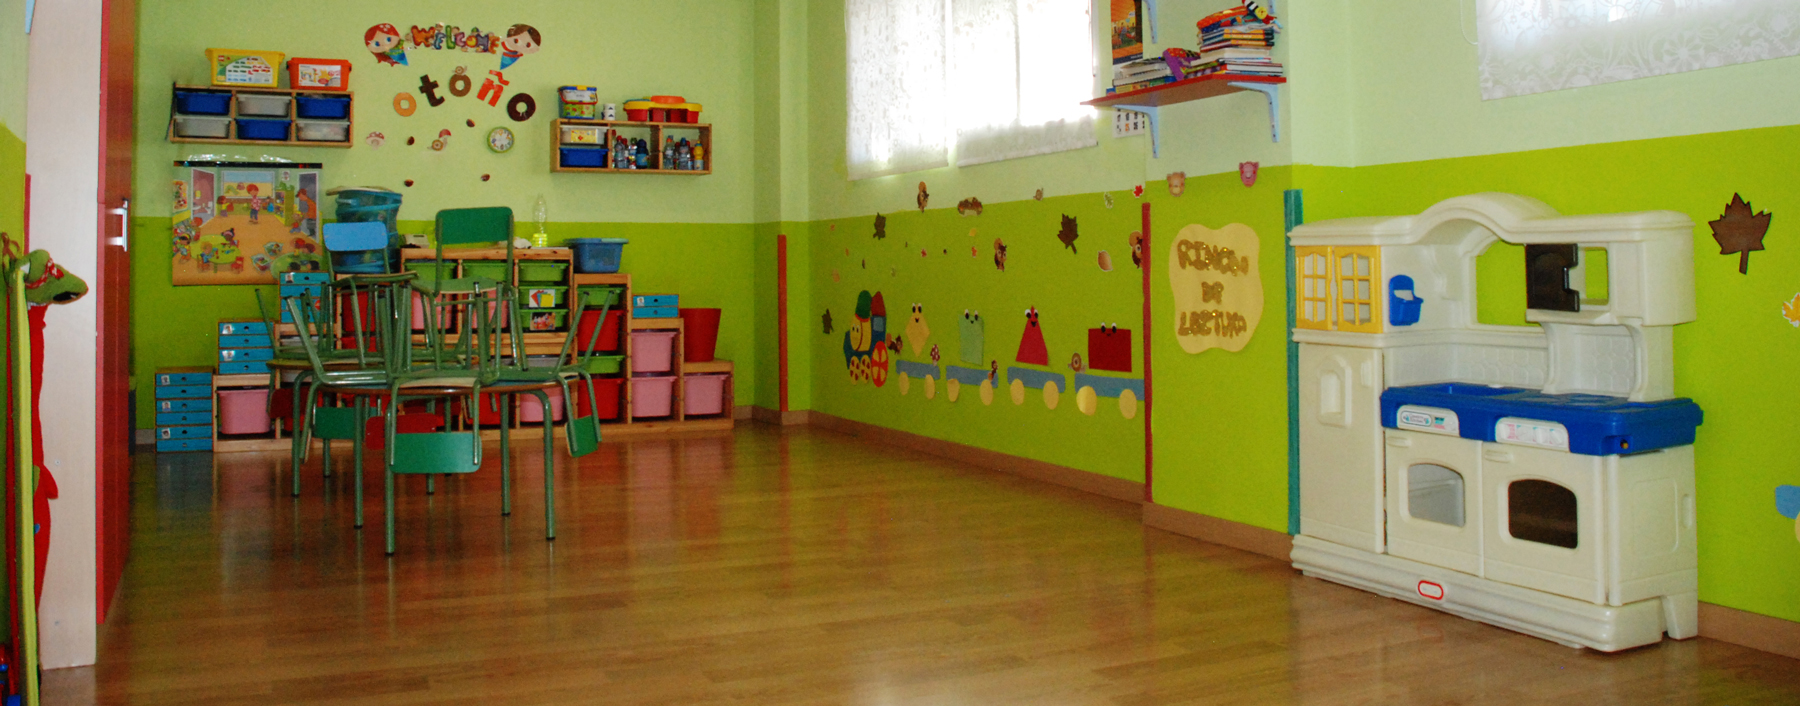 centro de educacion infantil en cordoba manolo álvaro